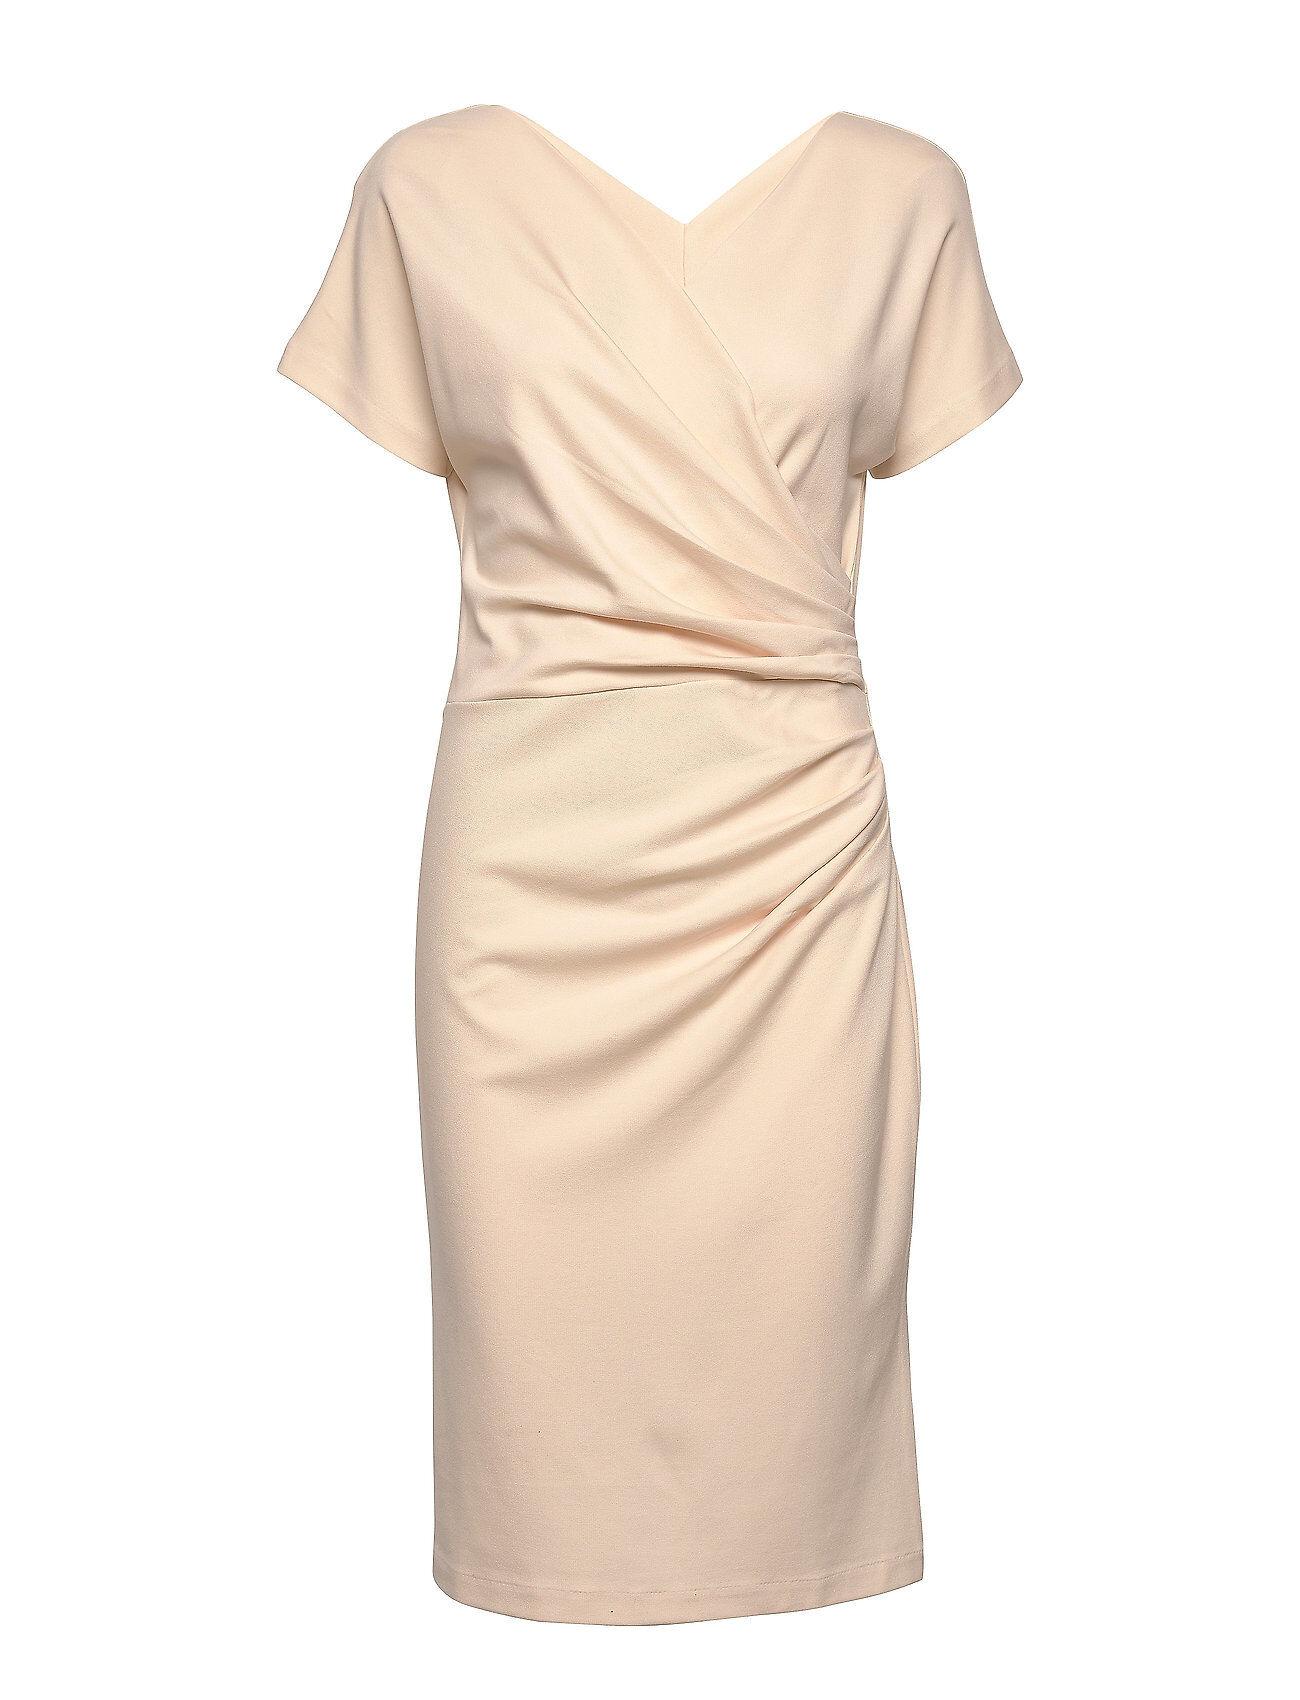 Residus Ava Ecovero Dress Polvipituinen Mekko Beige Residus